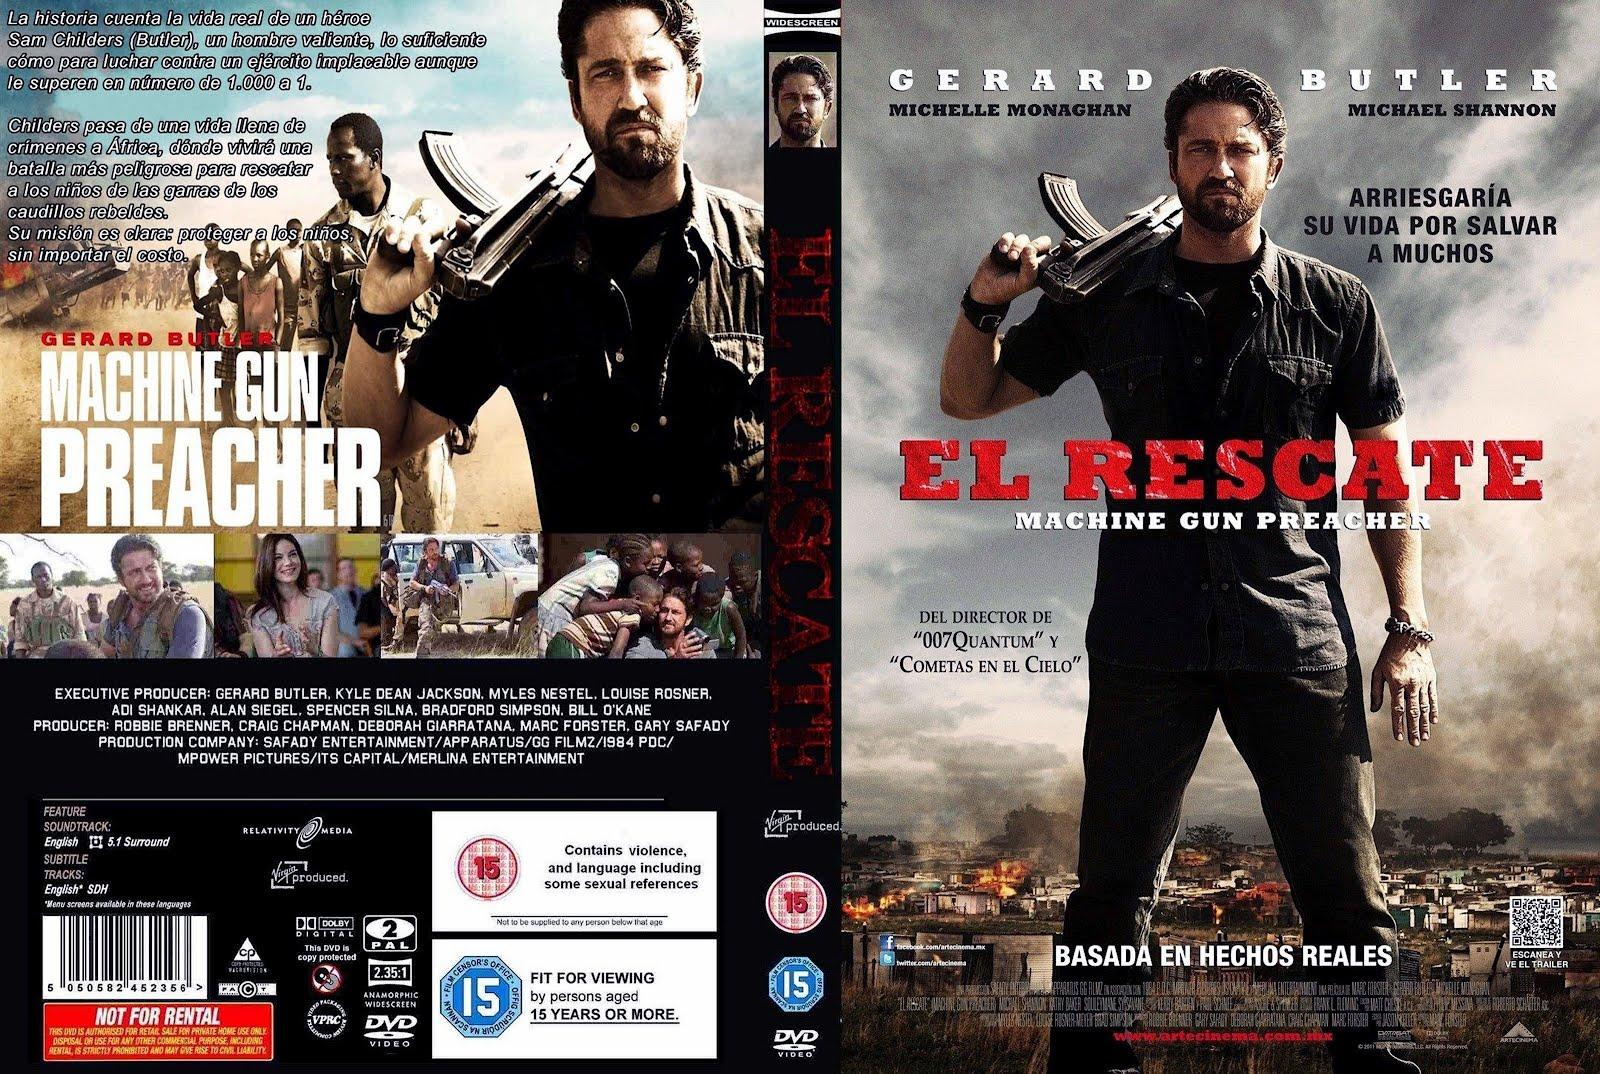 El Rescate Machine Gun Preacher Front Dvd Cover